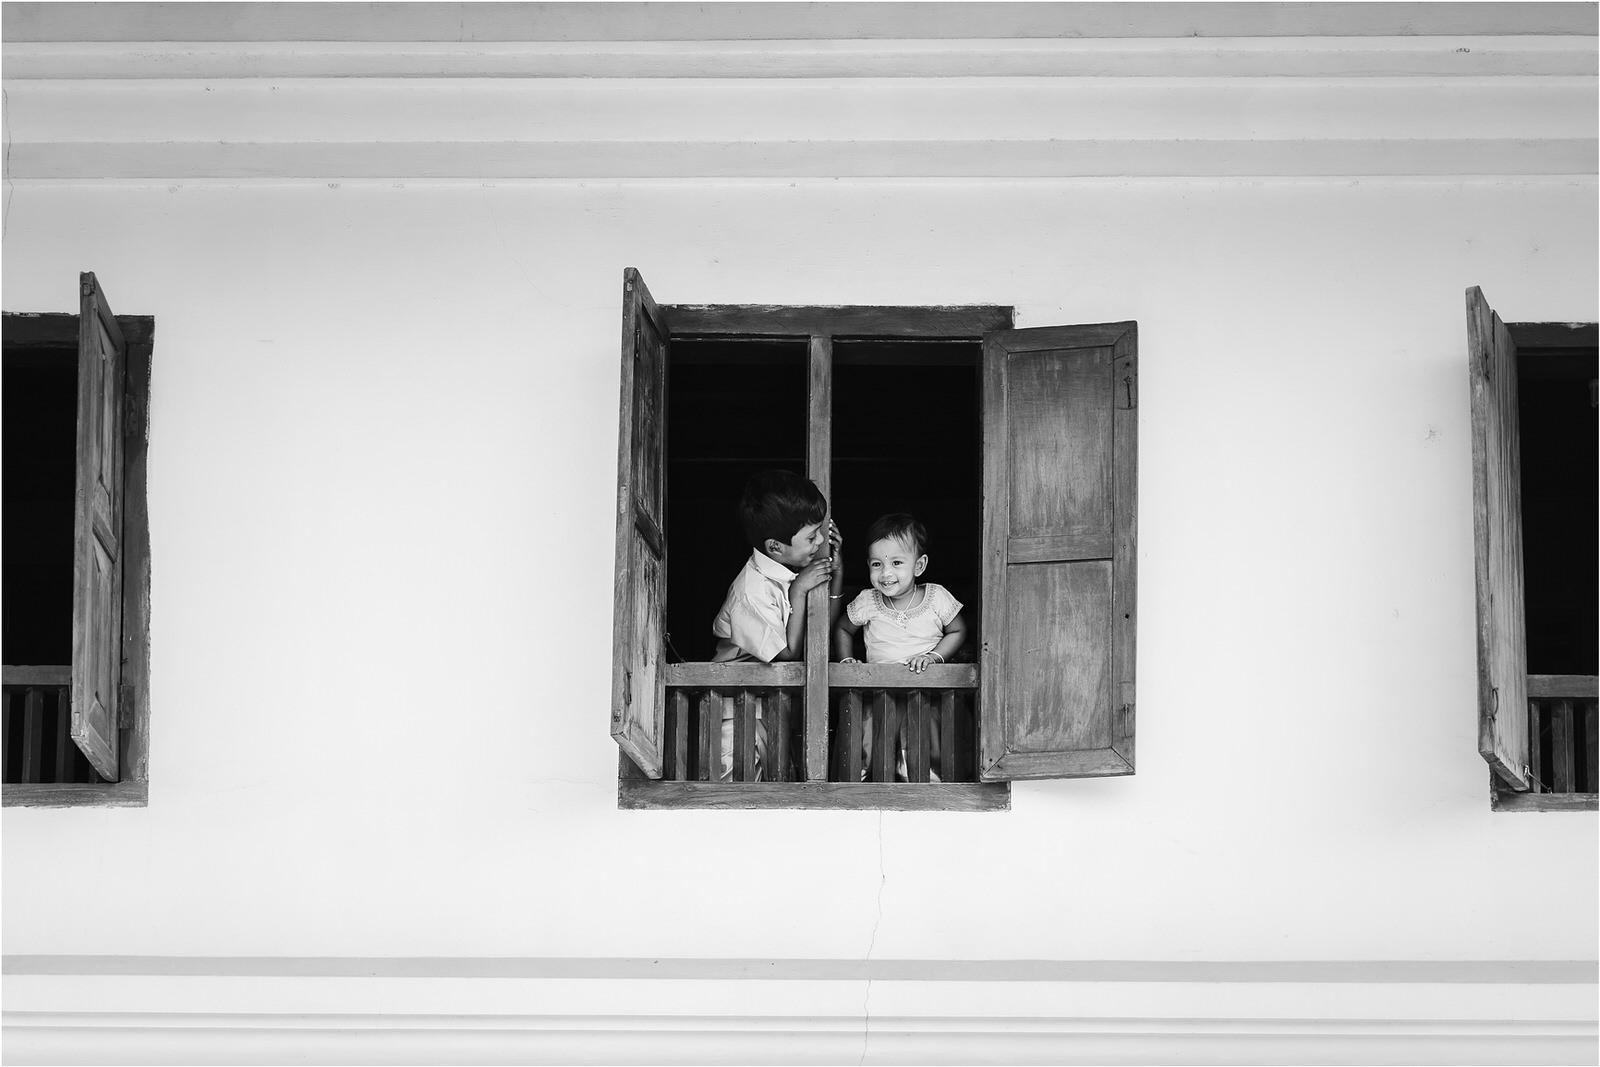 19012019-Nila-Pratyush-Family-Shoot-581.jpg